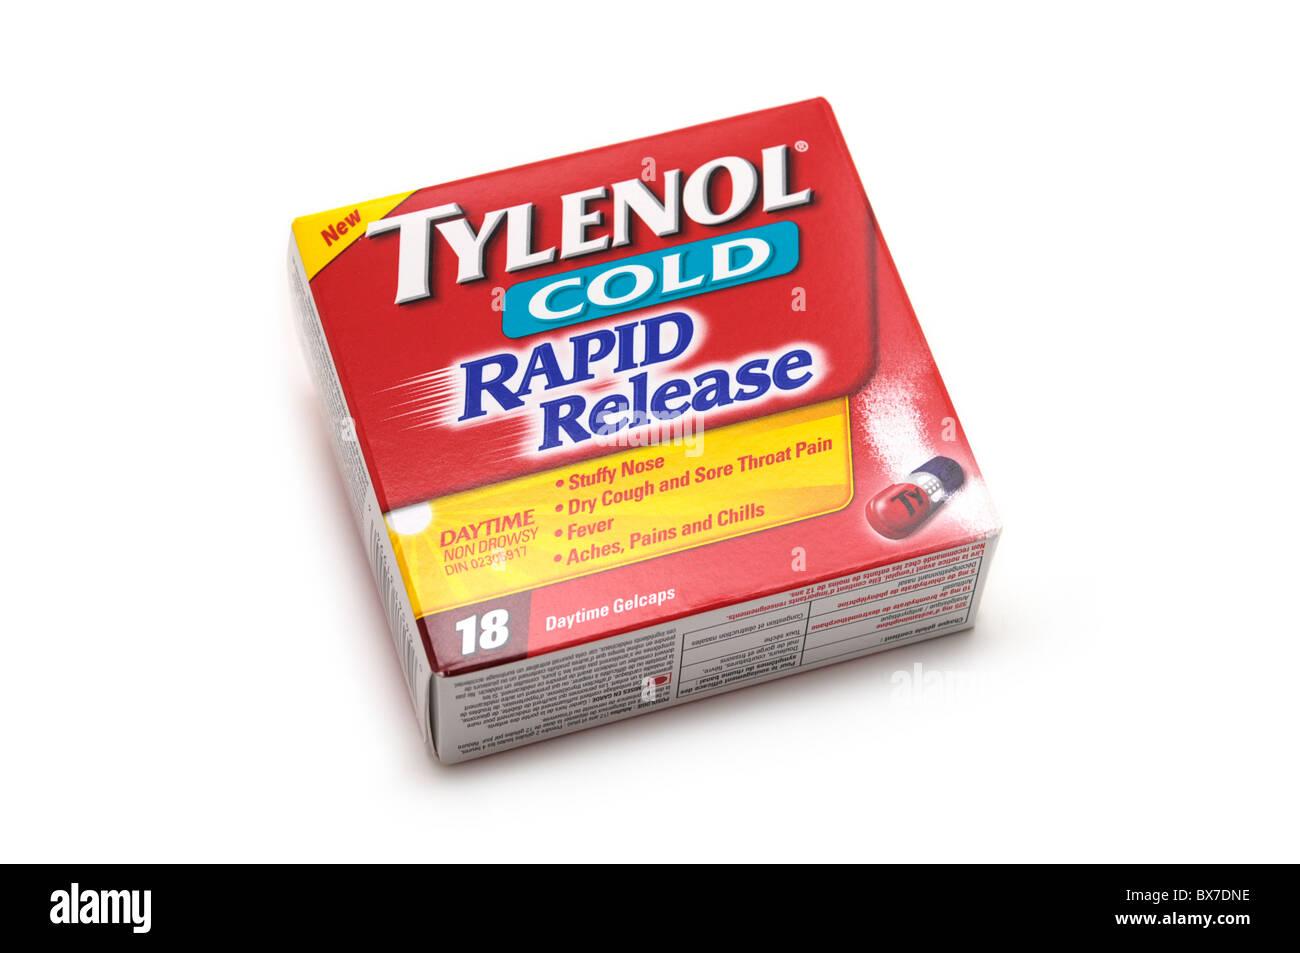 Cold Symptoms Relief Capsules - Stock Image